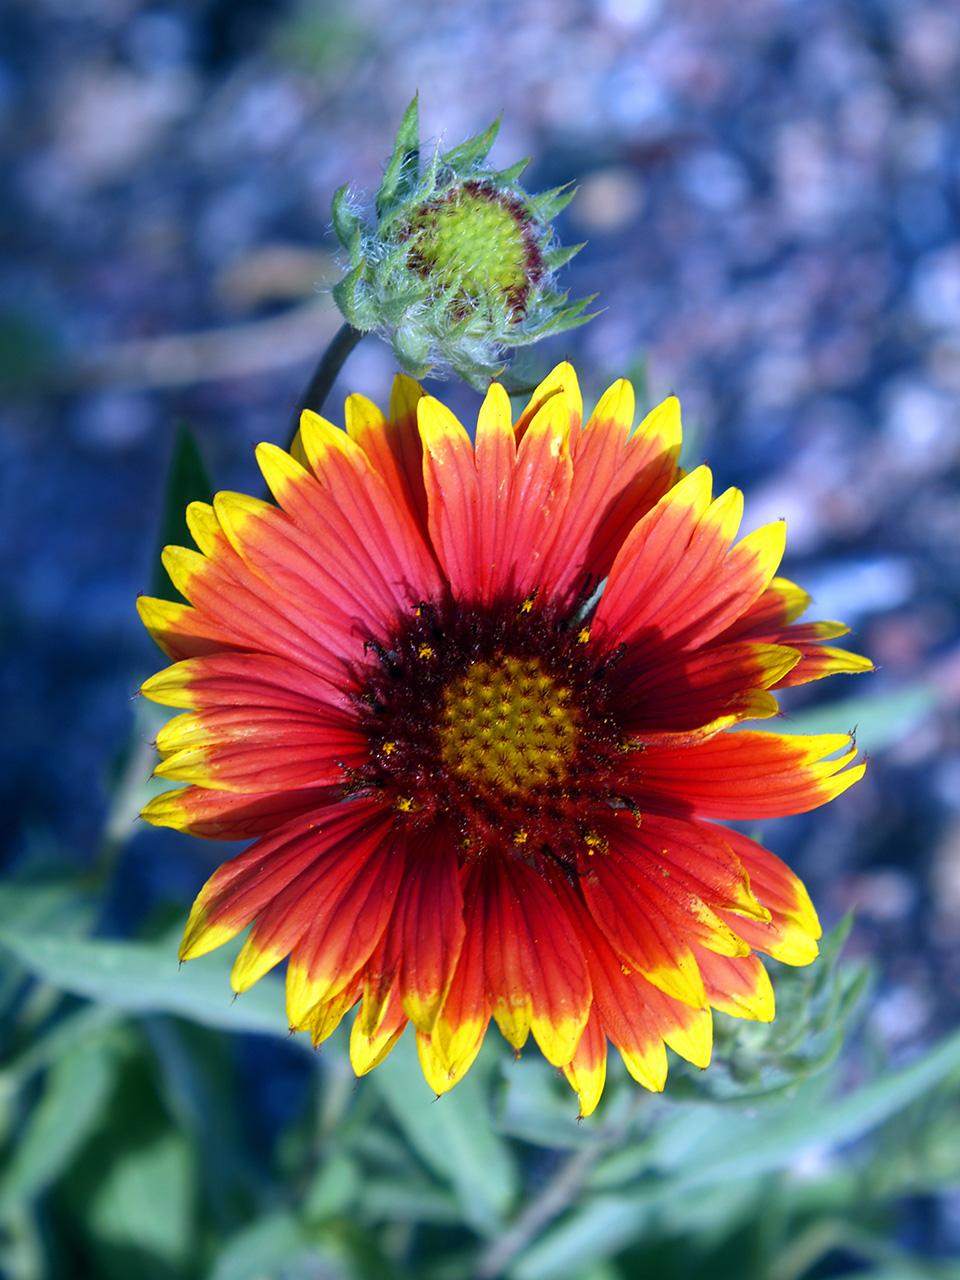 Wildflowers Mount Rushmore National Memorial Us National Park